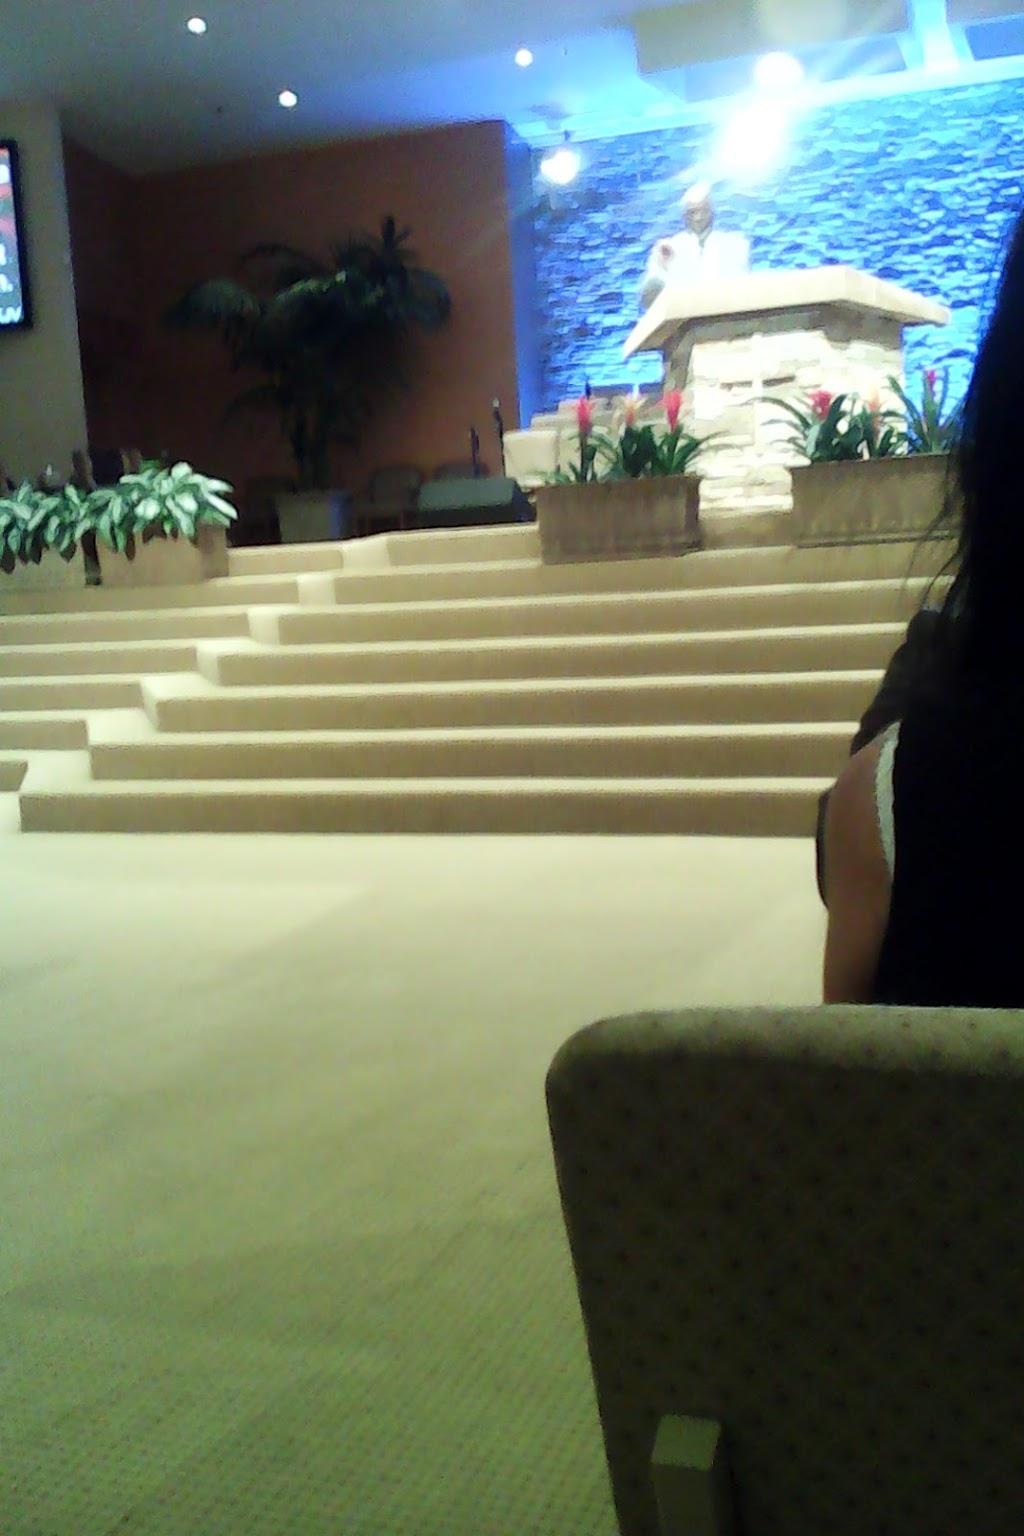 Love & Unity Christian Fellowship - church  | Photo 8 of 10 | Address: 1840 S Wilmington Ave, Compton, CA 90220, USA | Phone: (310) 604-5900